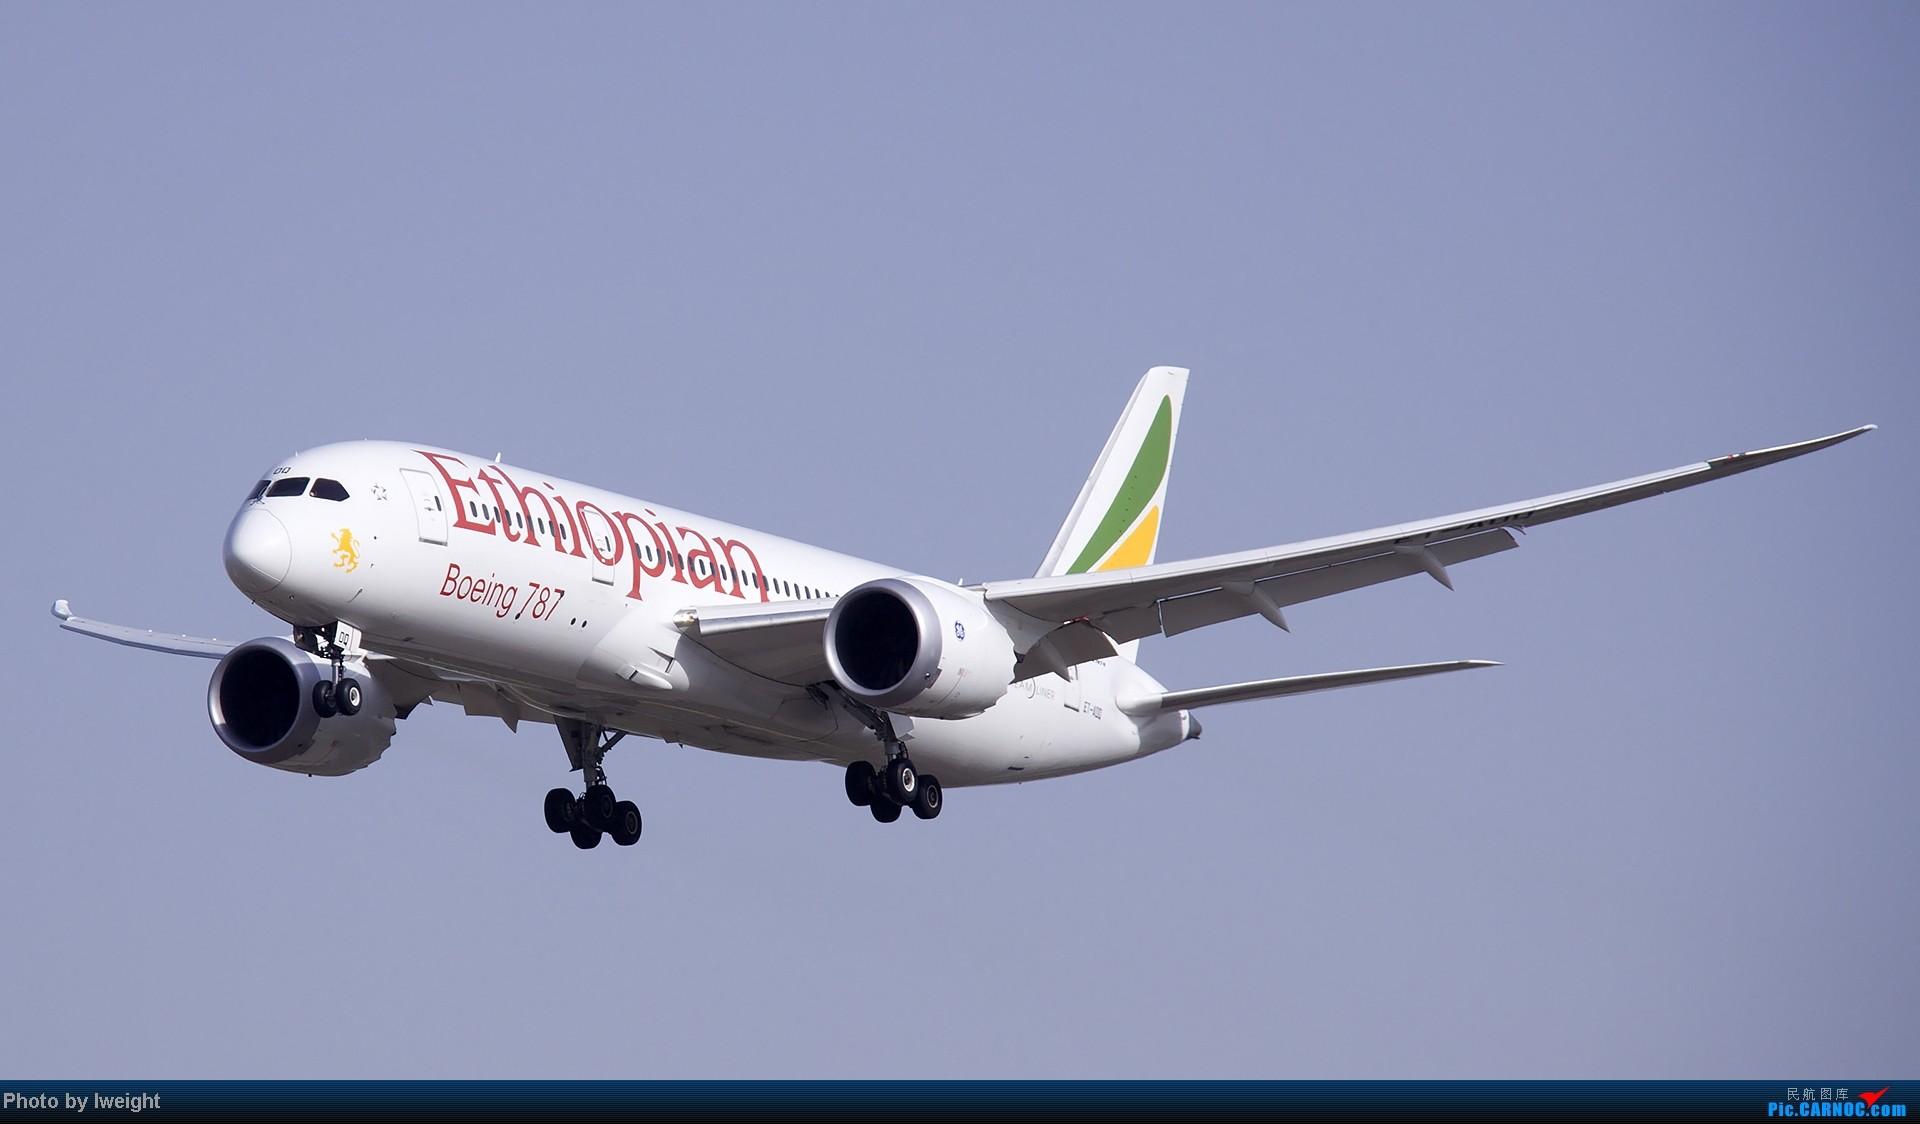 Re:[原创]5月3日首都机场风云变幻的下午 BOEING 787-8 ET-AOQ 中国北京首都机场